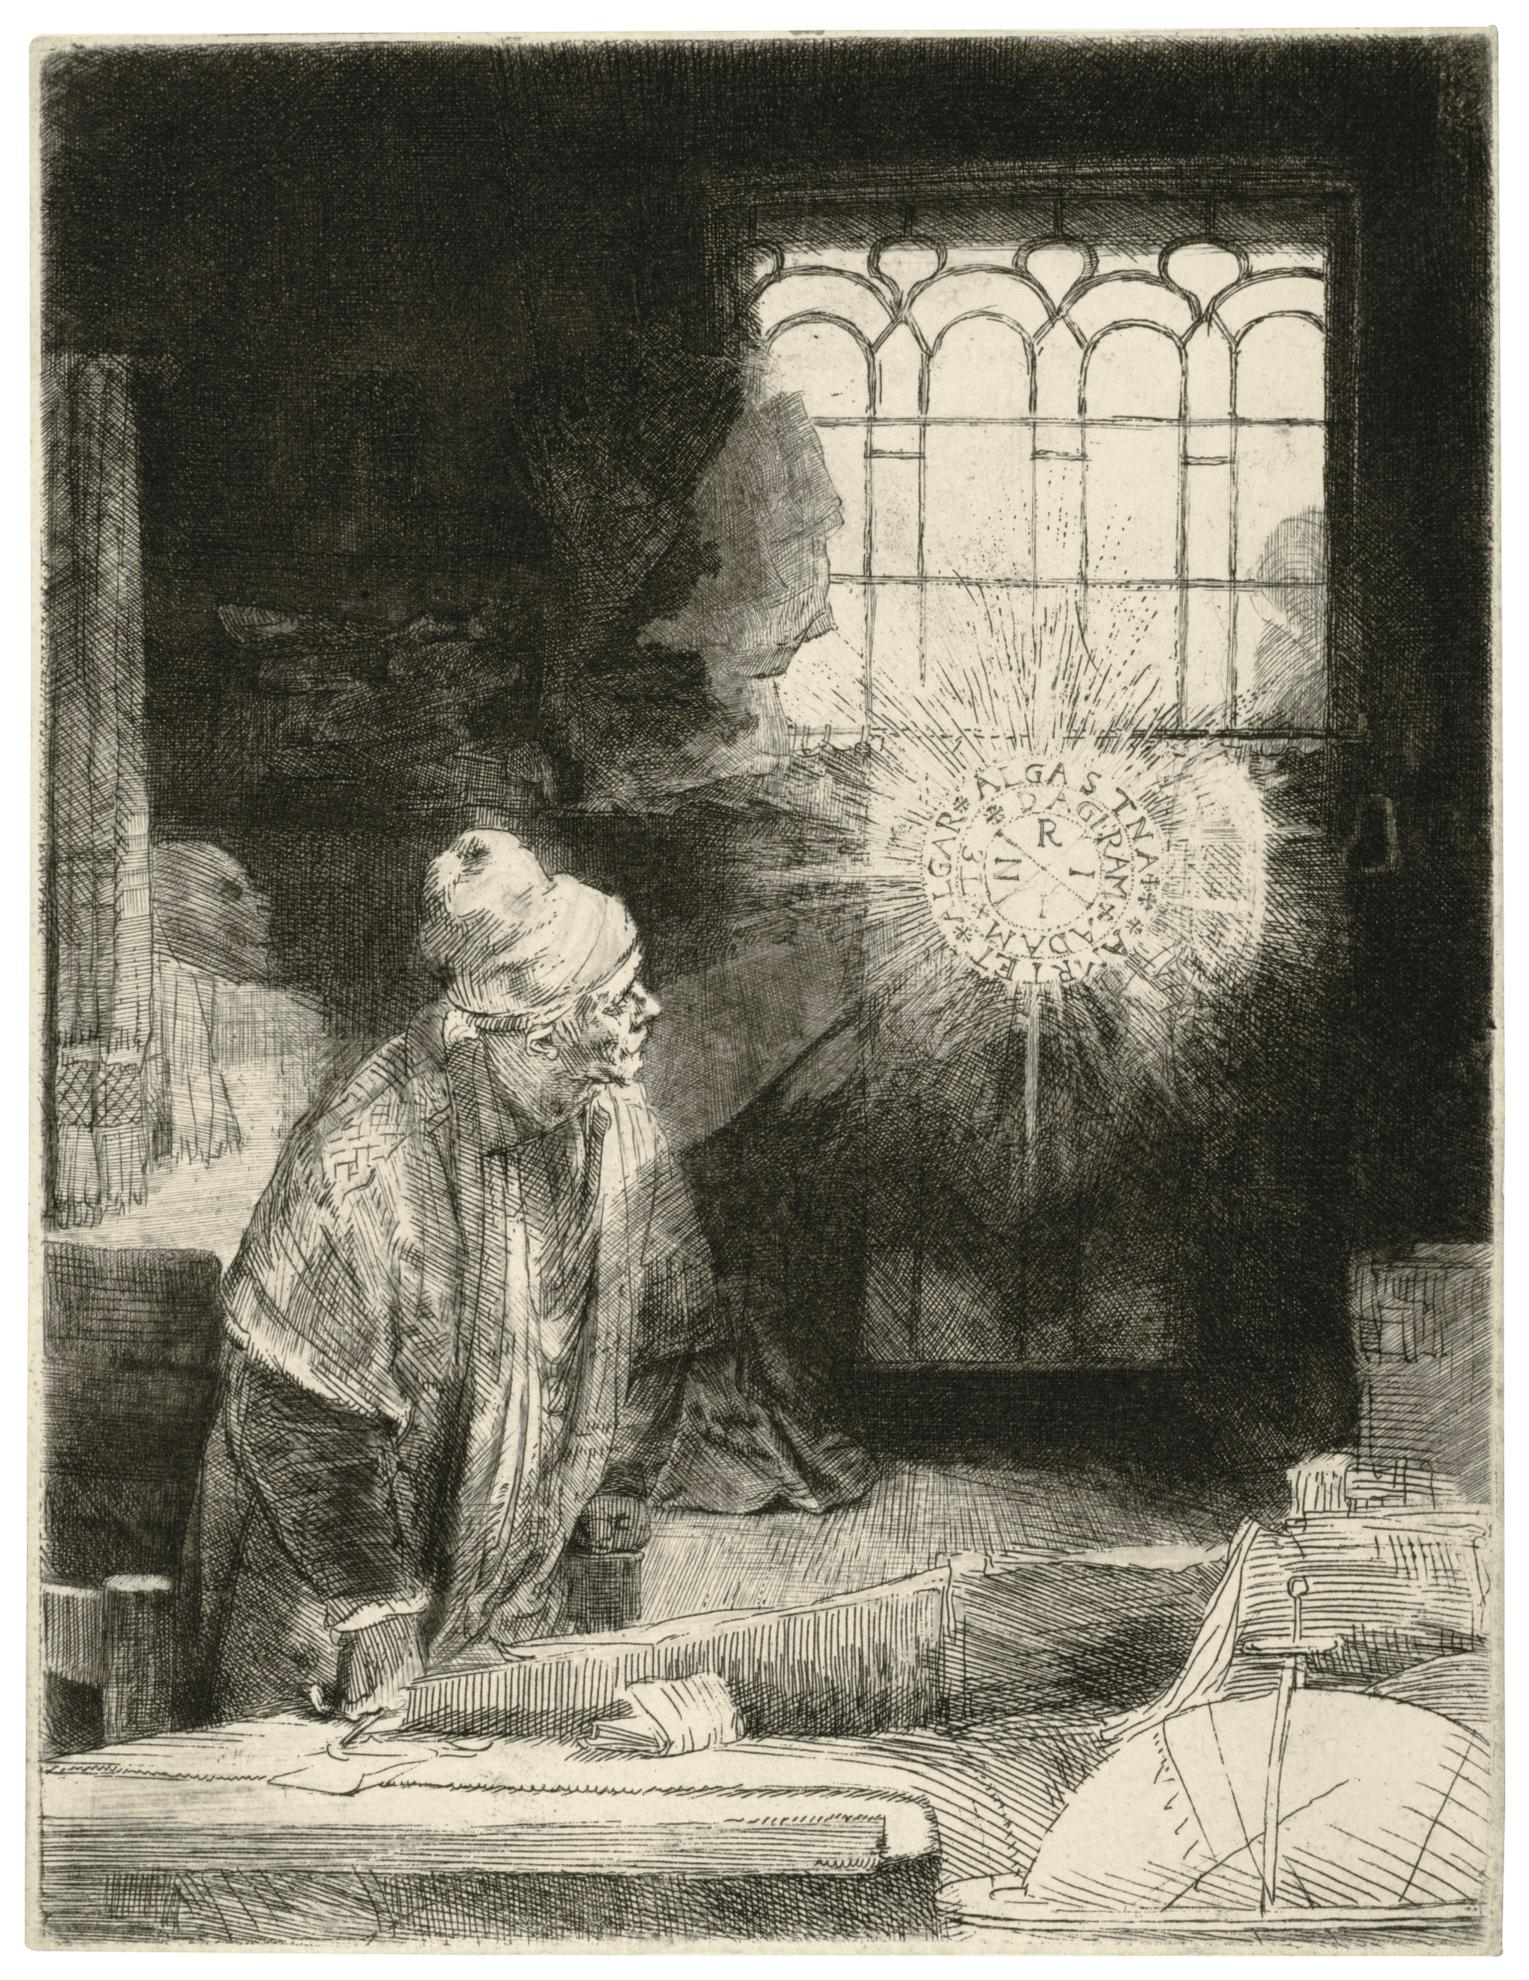 Rembrandt van Rijn-A Scholar In His Study (Faust) (B., Holl. 270; New Holl. 270; H. 260)-1652